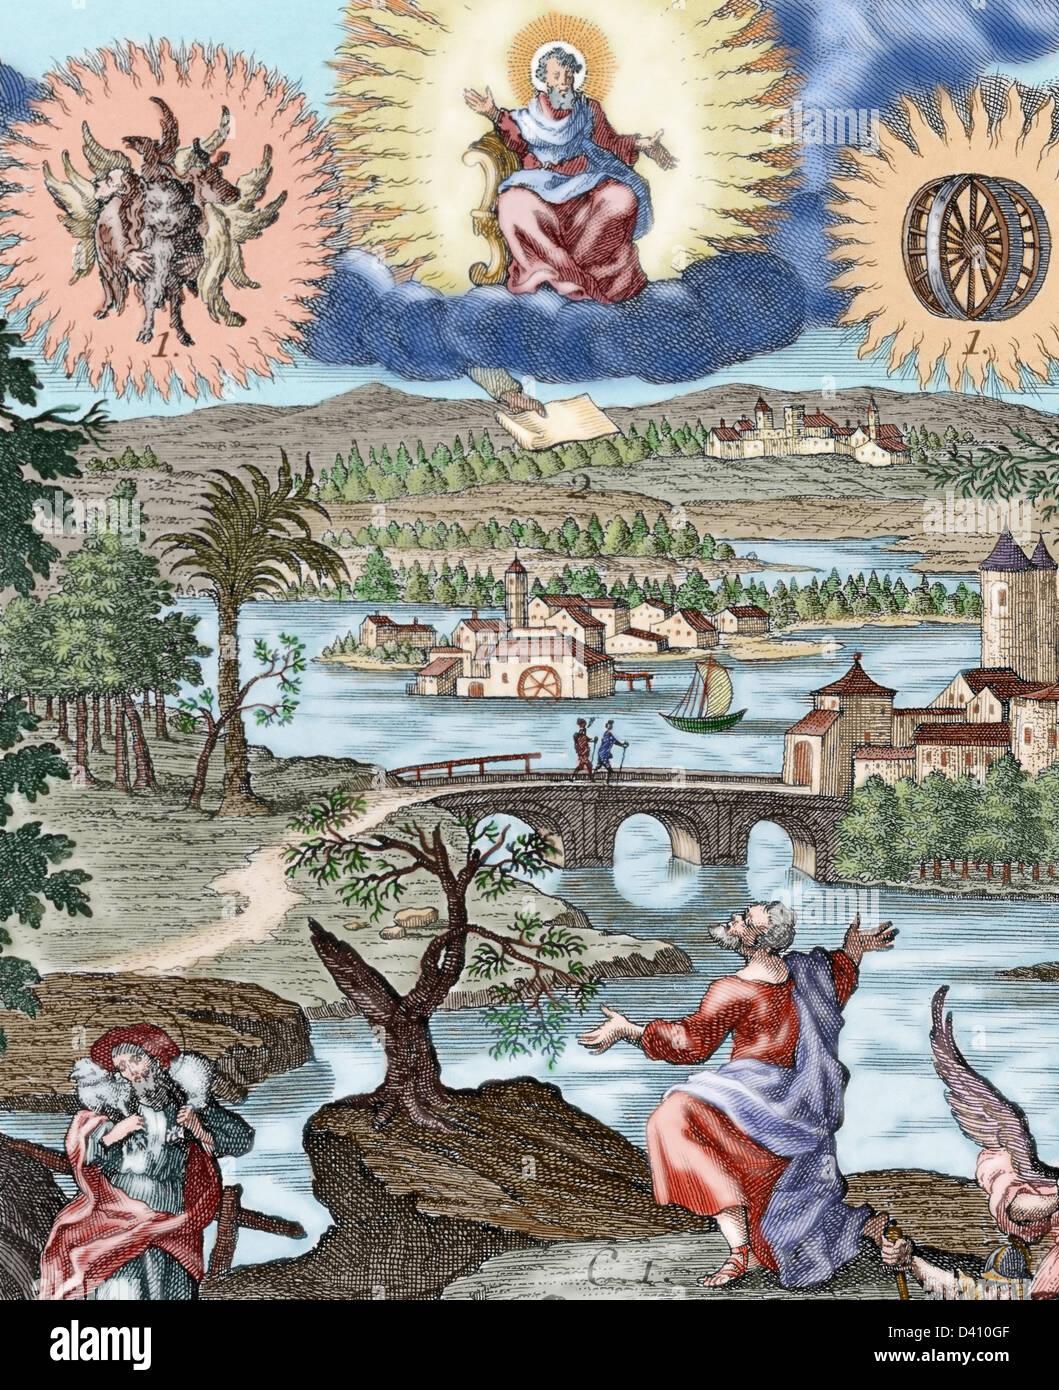 Ezekiel (622-570 BC). Hebrew prophet. Vision of Ezekiel. Colored engraving. - Stock Image